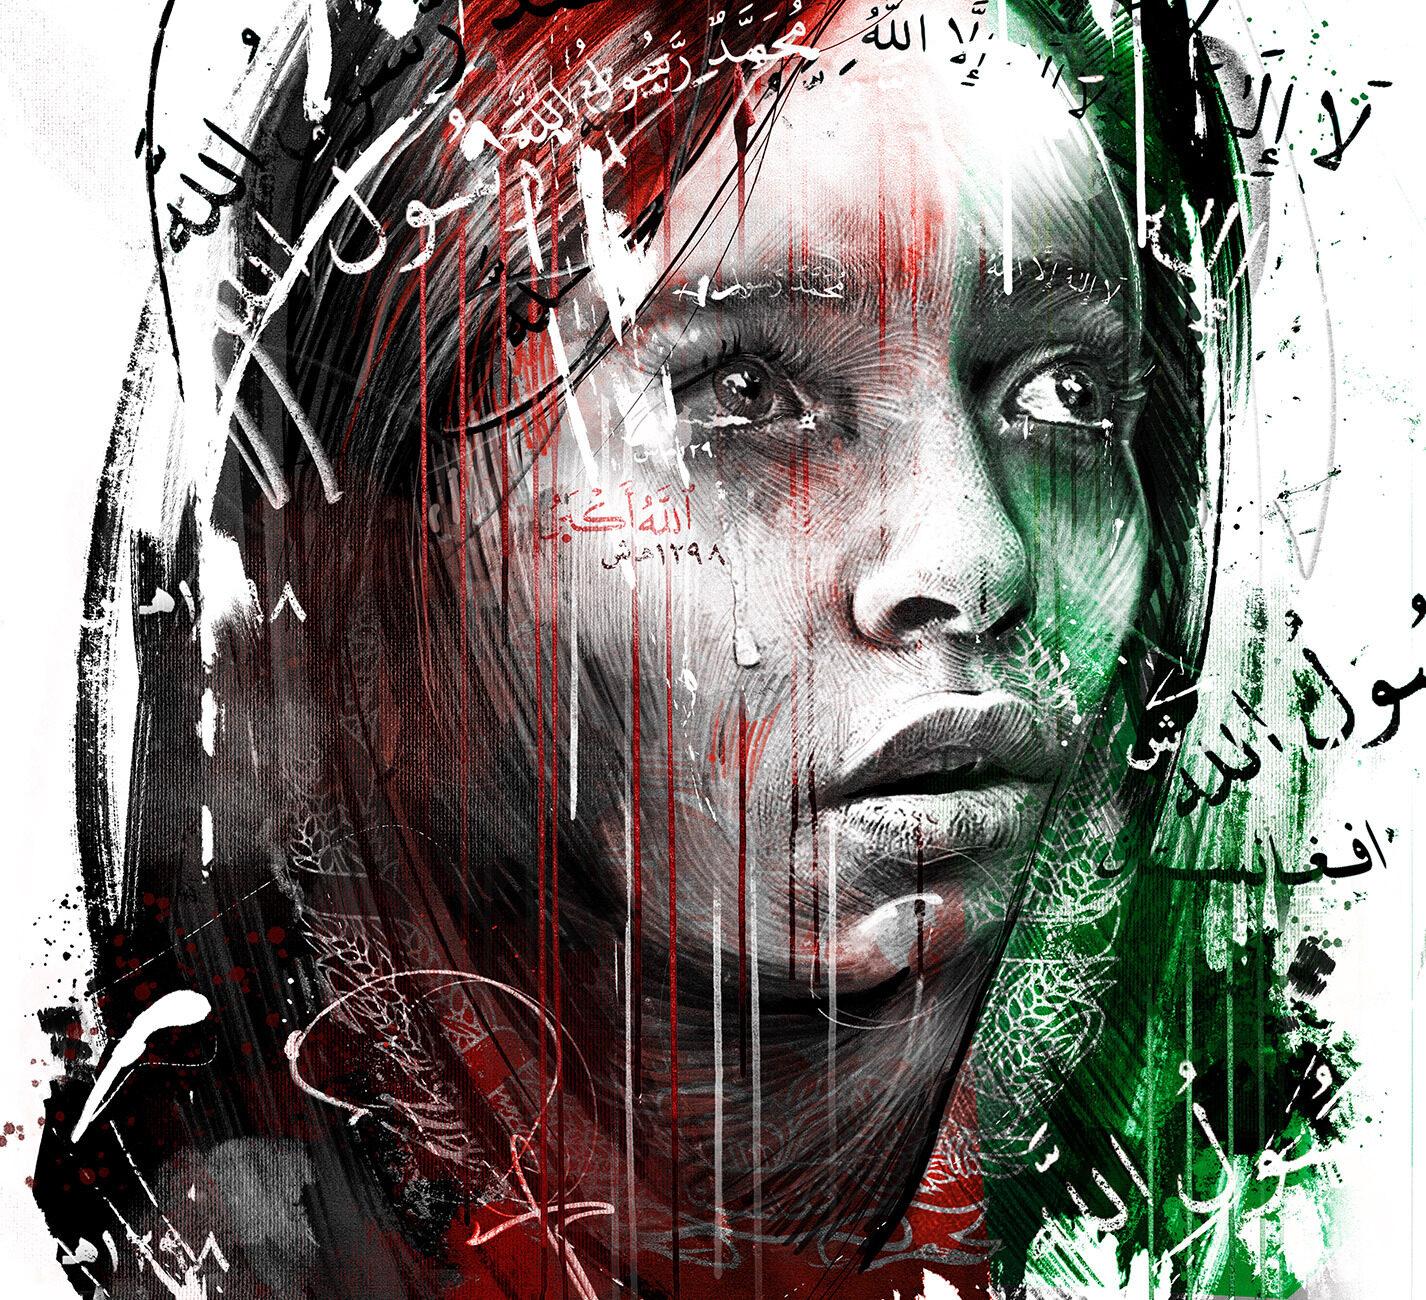 Afghanistan woman women human rights editorial illustration portrait conceptual - Kornel Illustration   Kornel Stadler portfolio